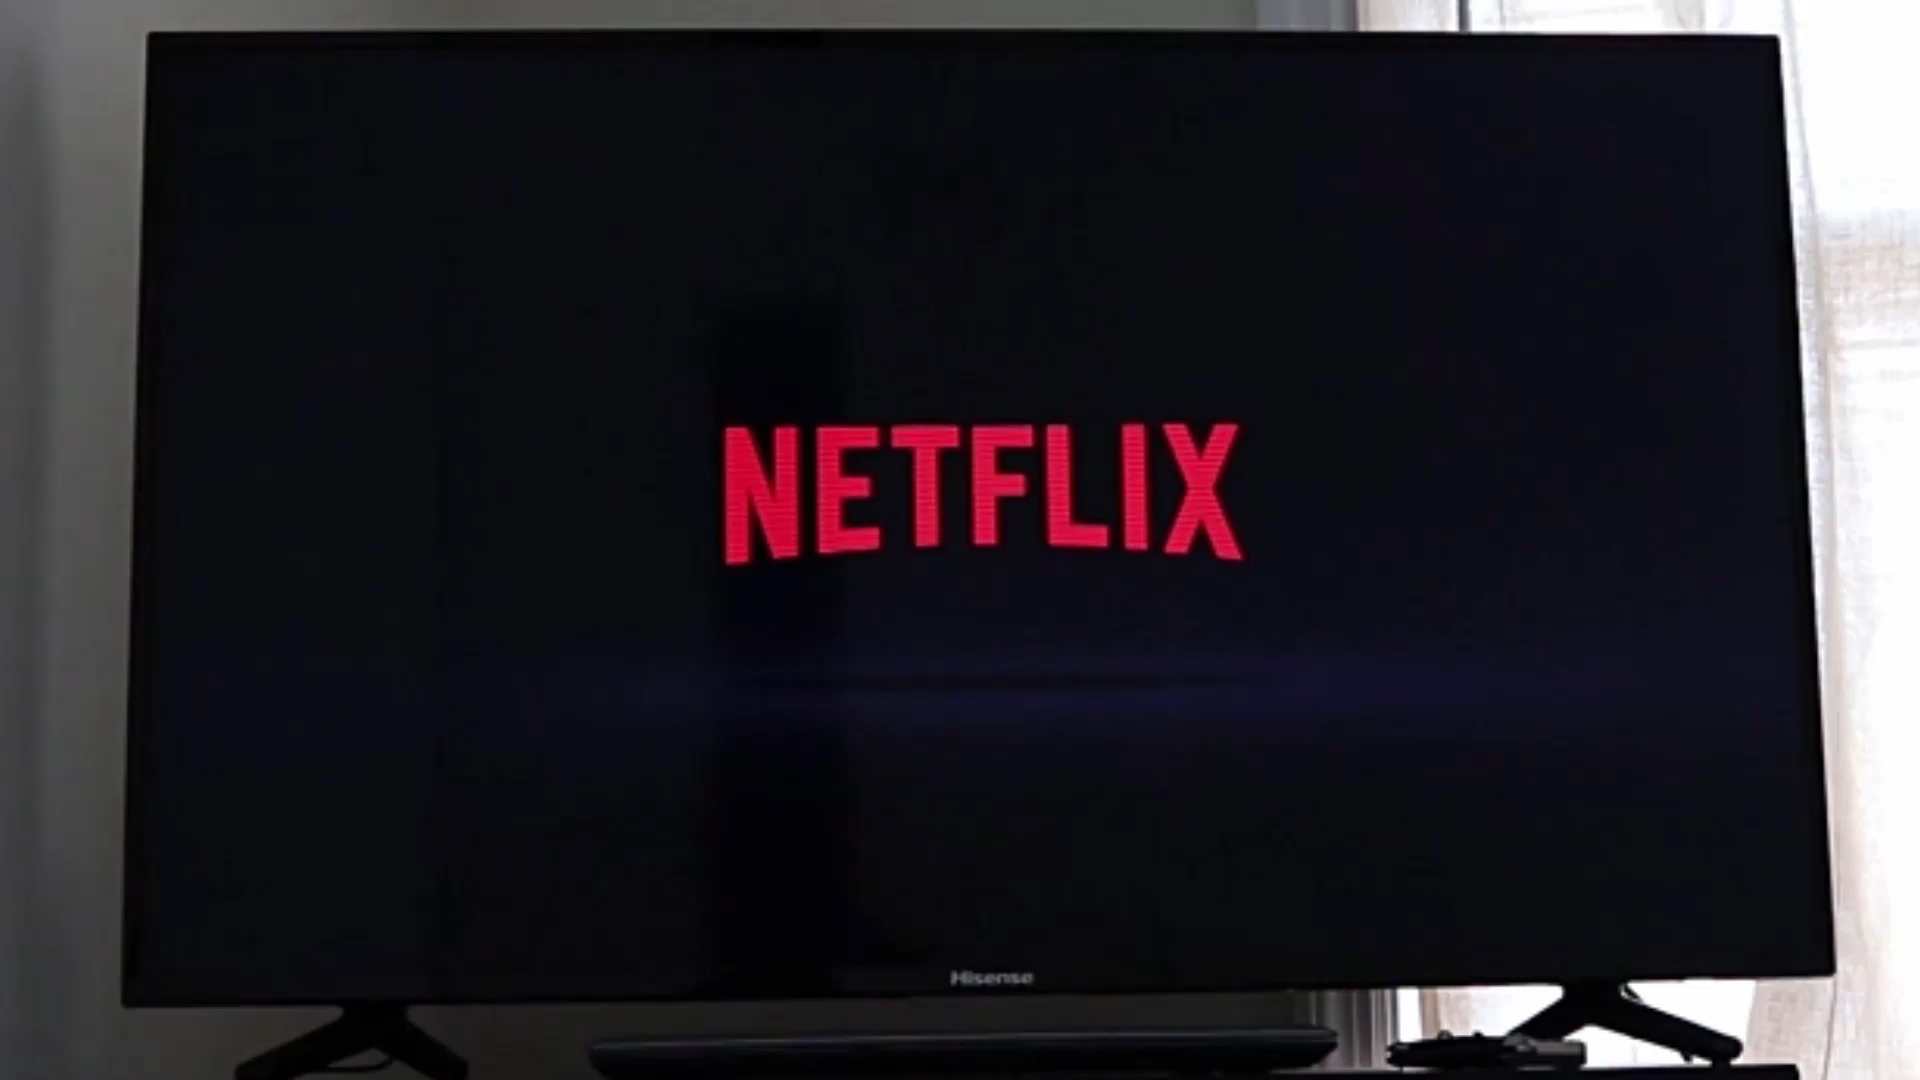 Midsomer Murders' Leaving Netflix in October 2019 - What's